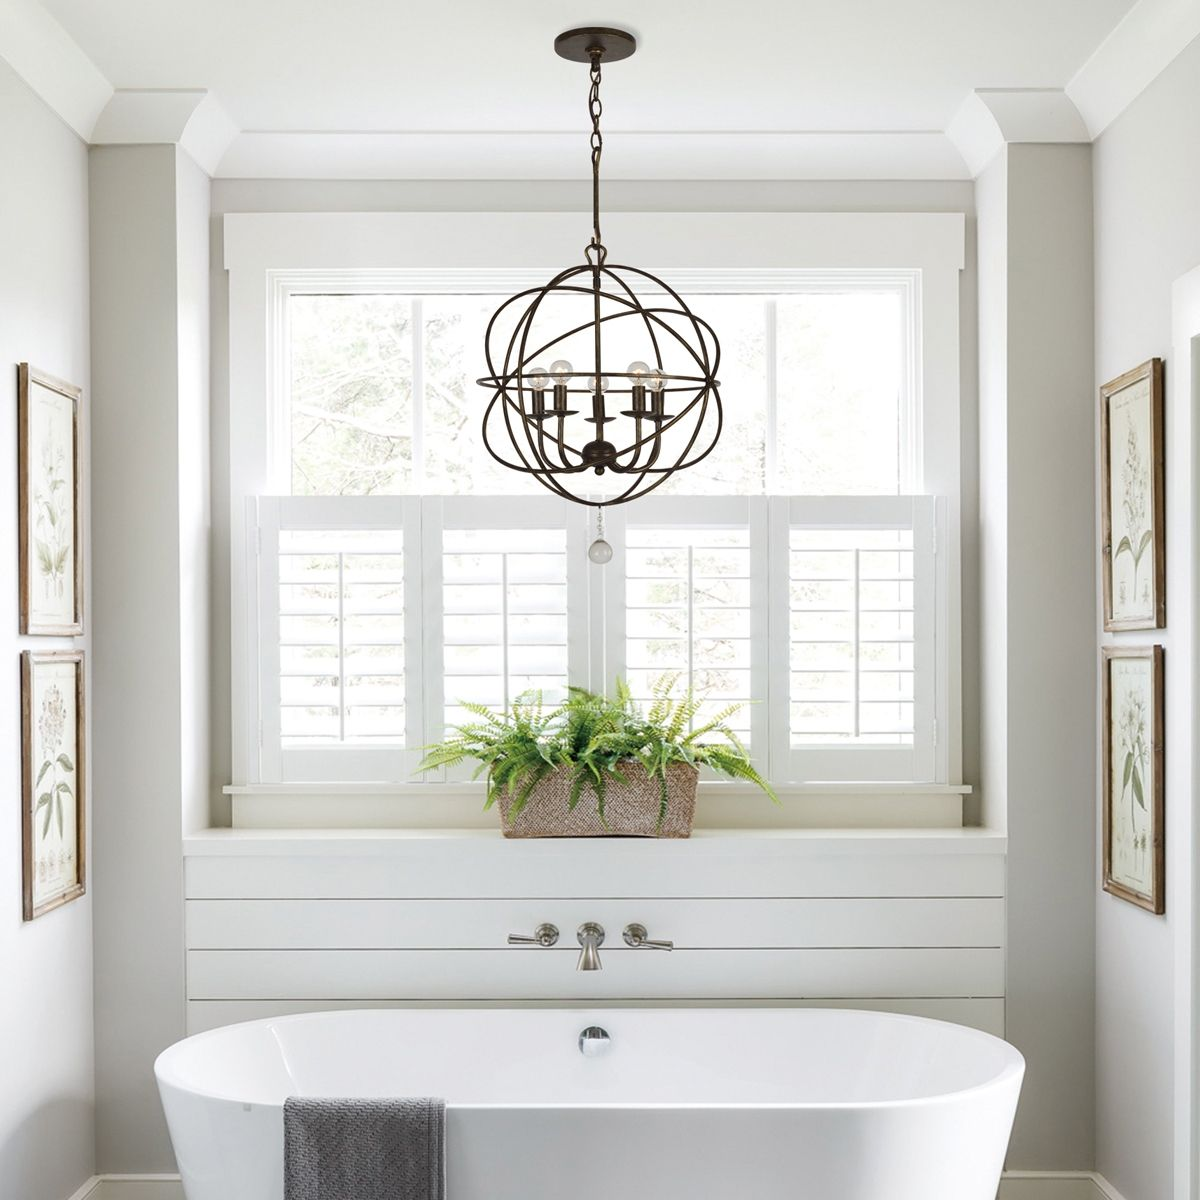 Bathroom Lighting Ideas In 2020 Globe Chandelier Bathroom Chandelier Bathroom Lighting Design